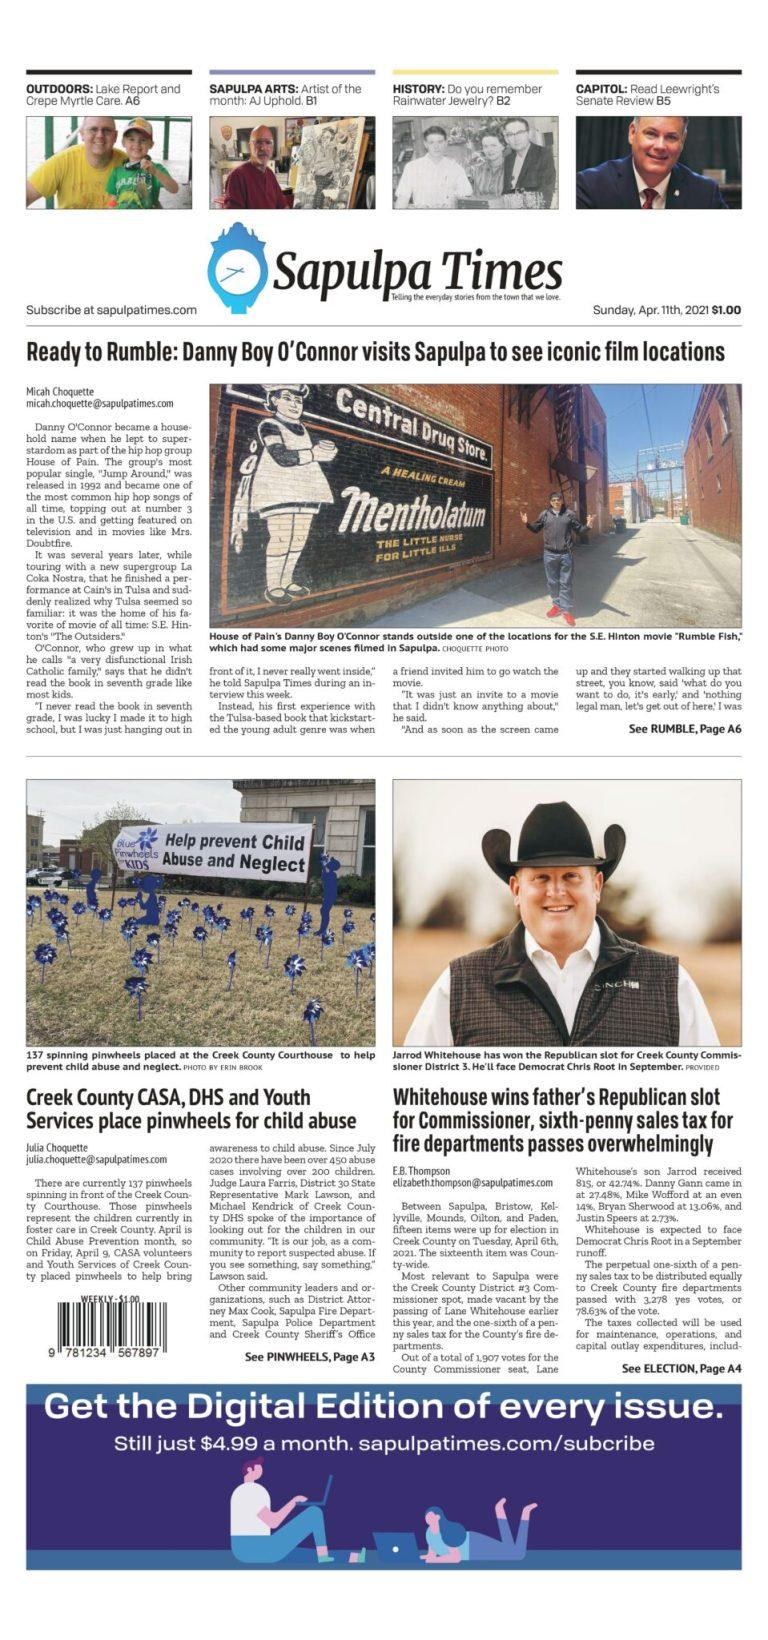 Sapulpa Times Digital Edition 04/11/2021